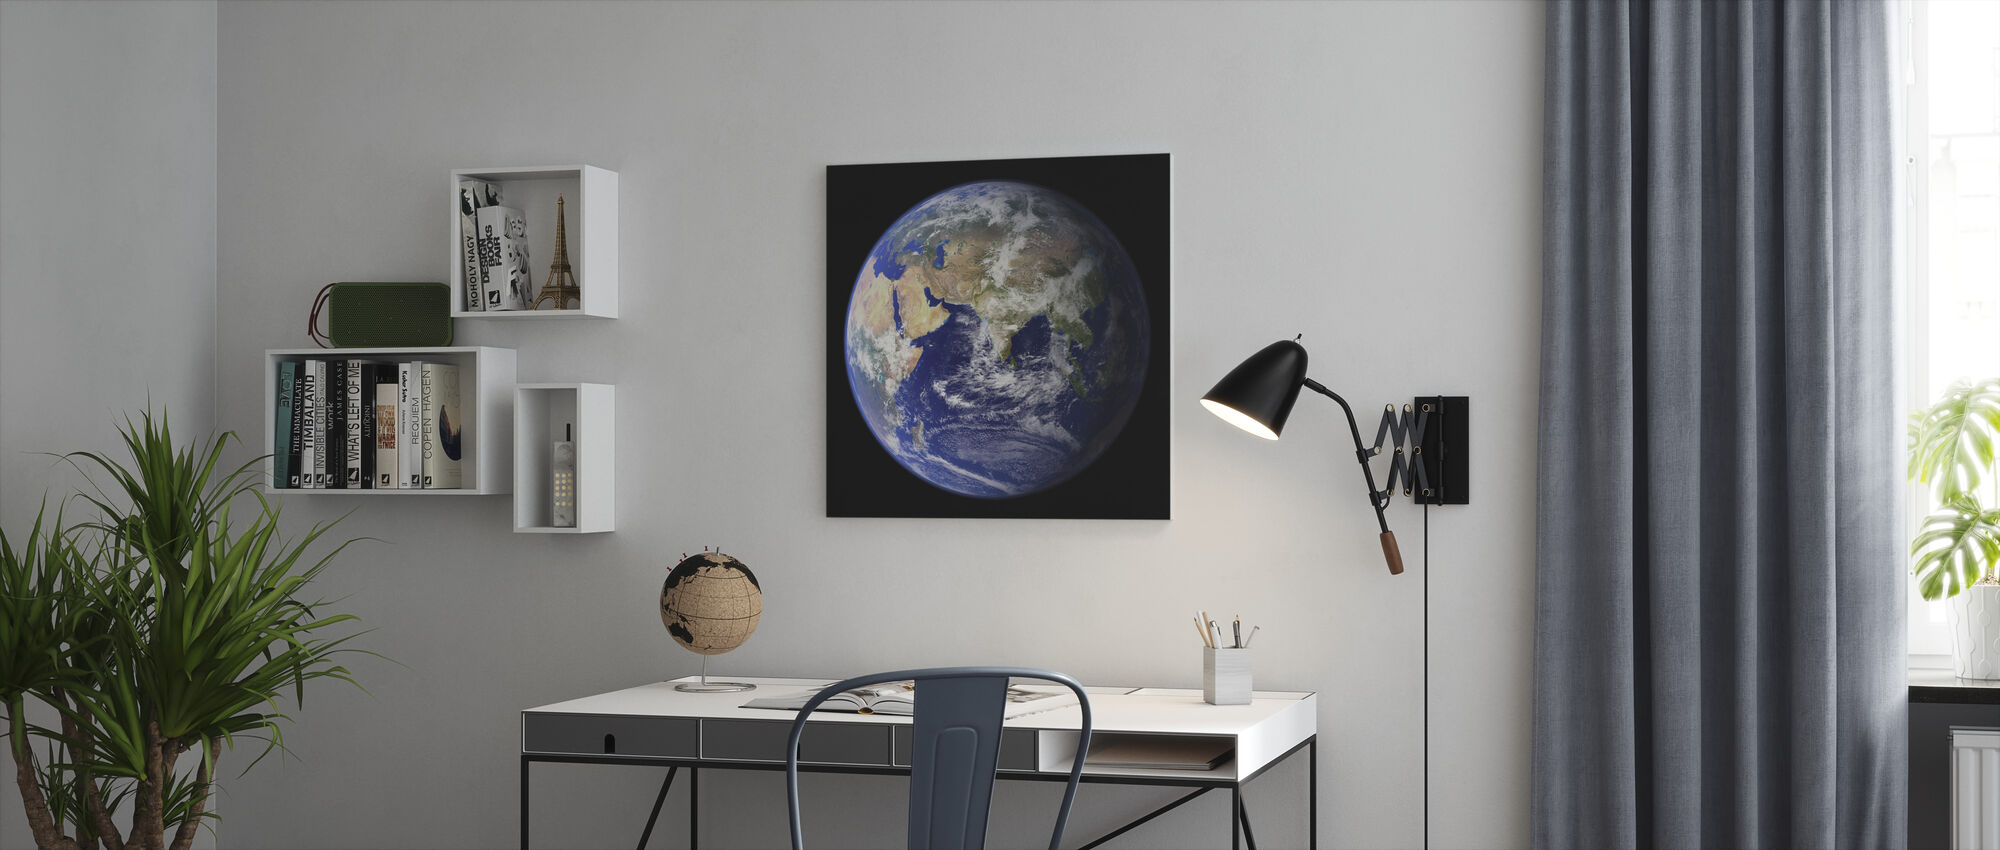 Jorden - Canvastavla - Kontor